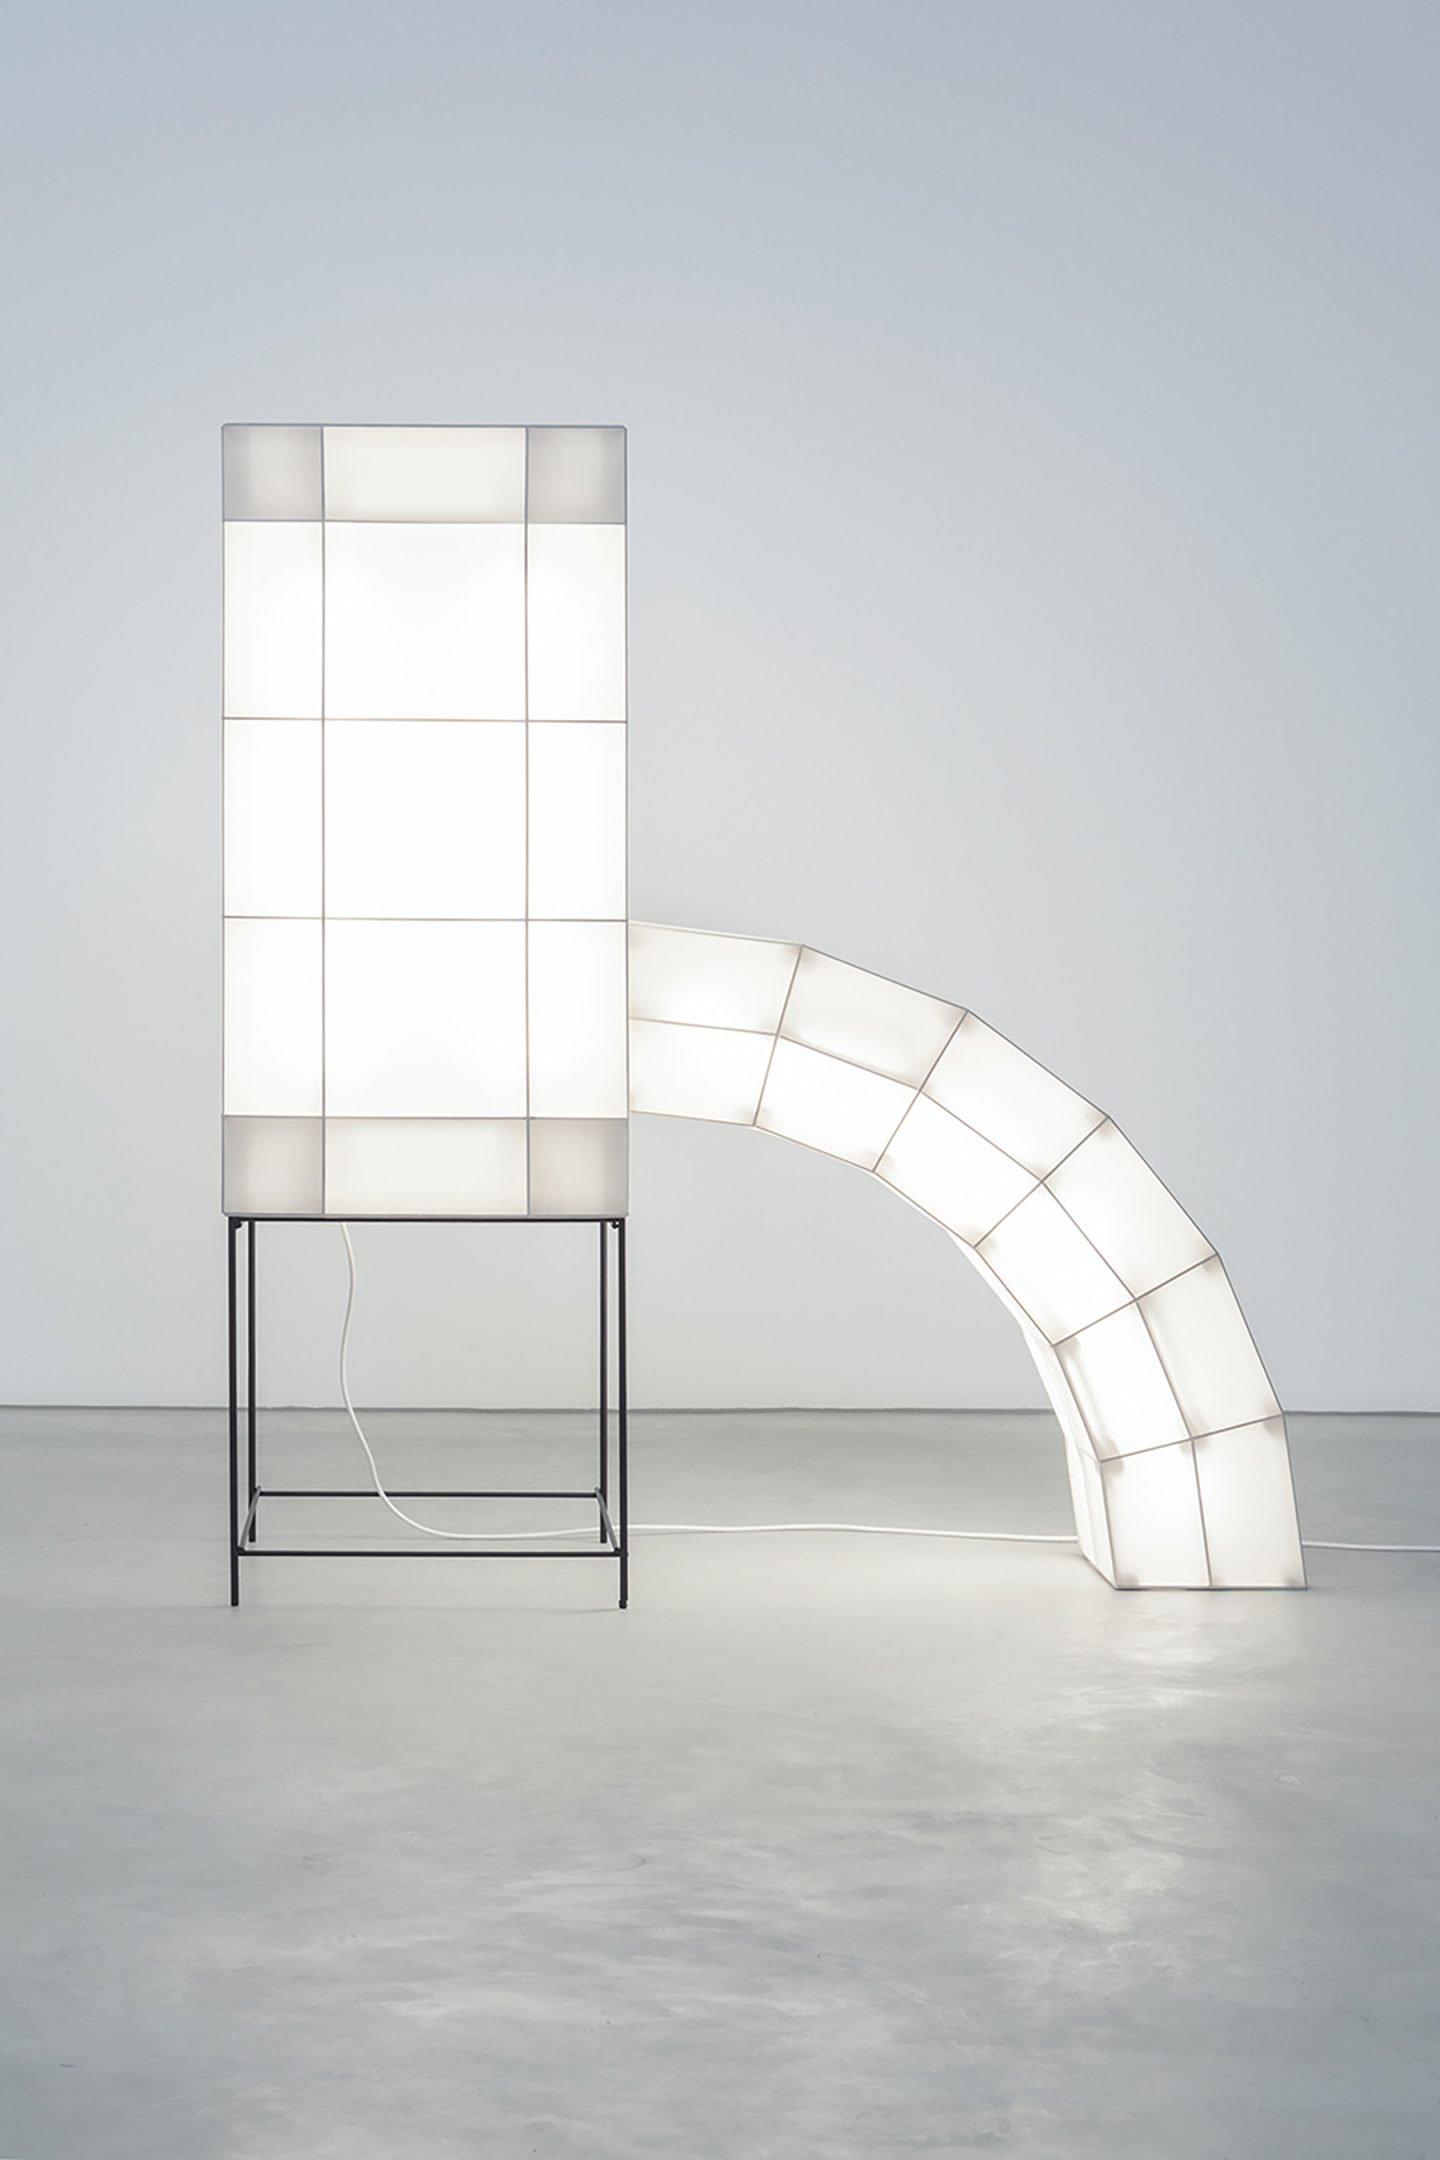 iGNANT-Design-Mieke-Meijer-Space-Frames-012